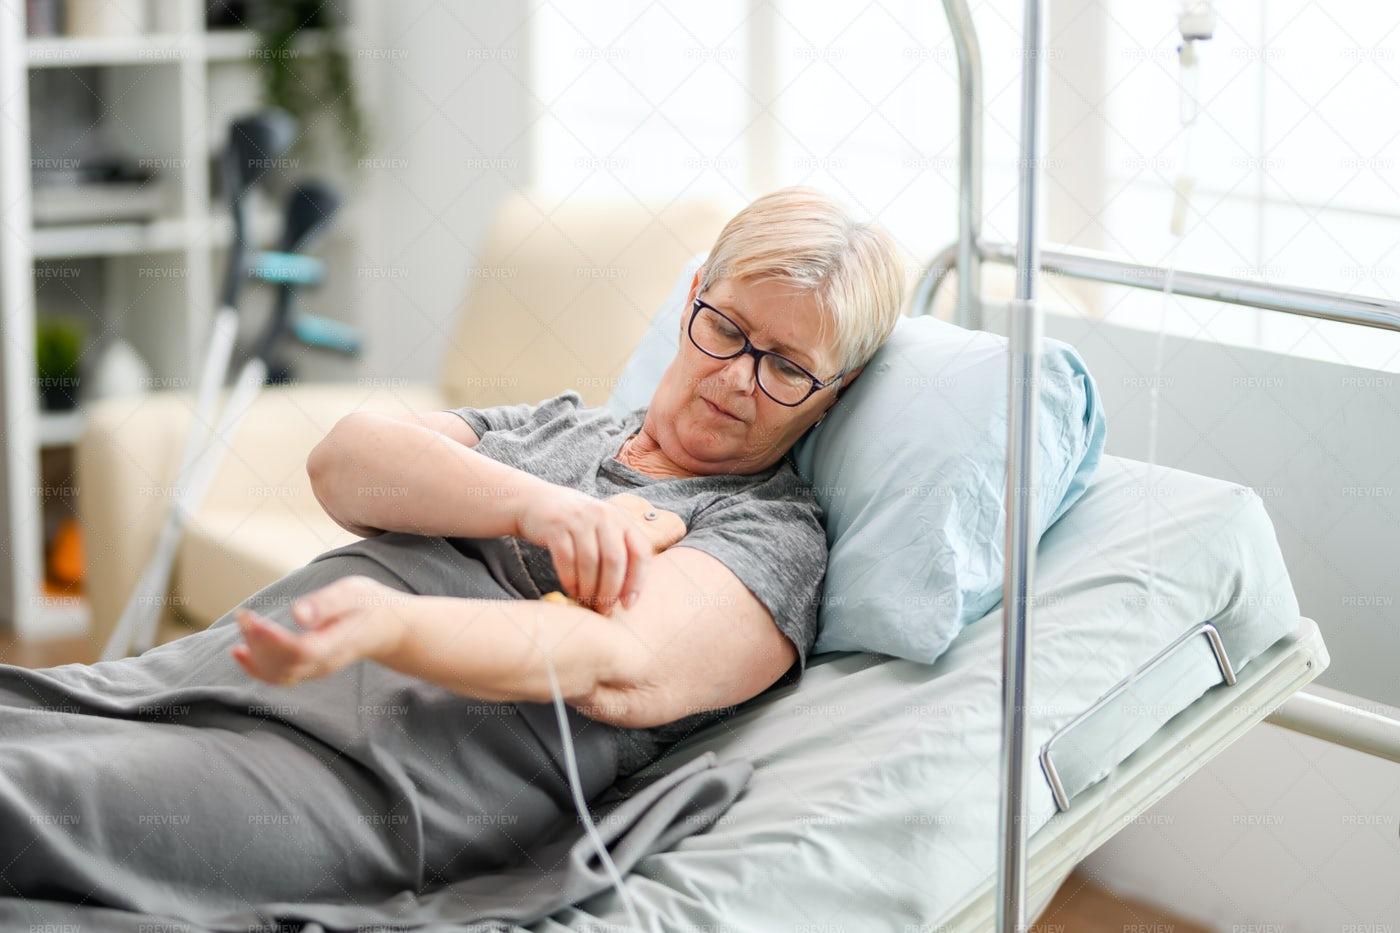 Female In A Nursing Home: Stock Photos